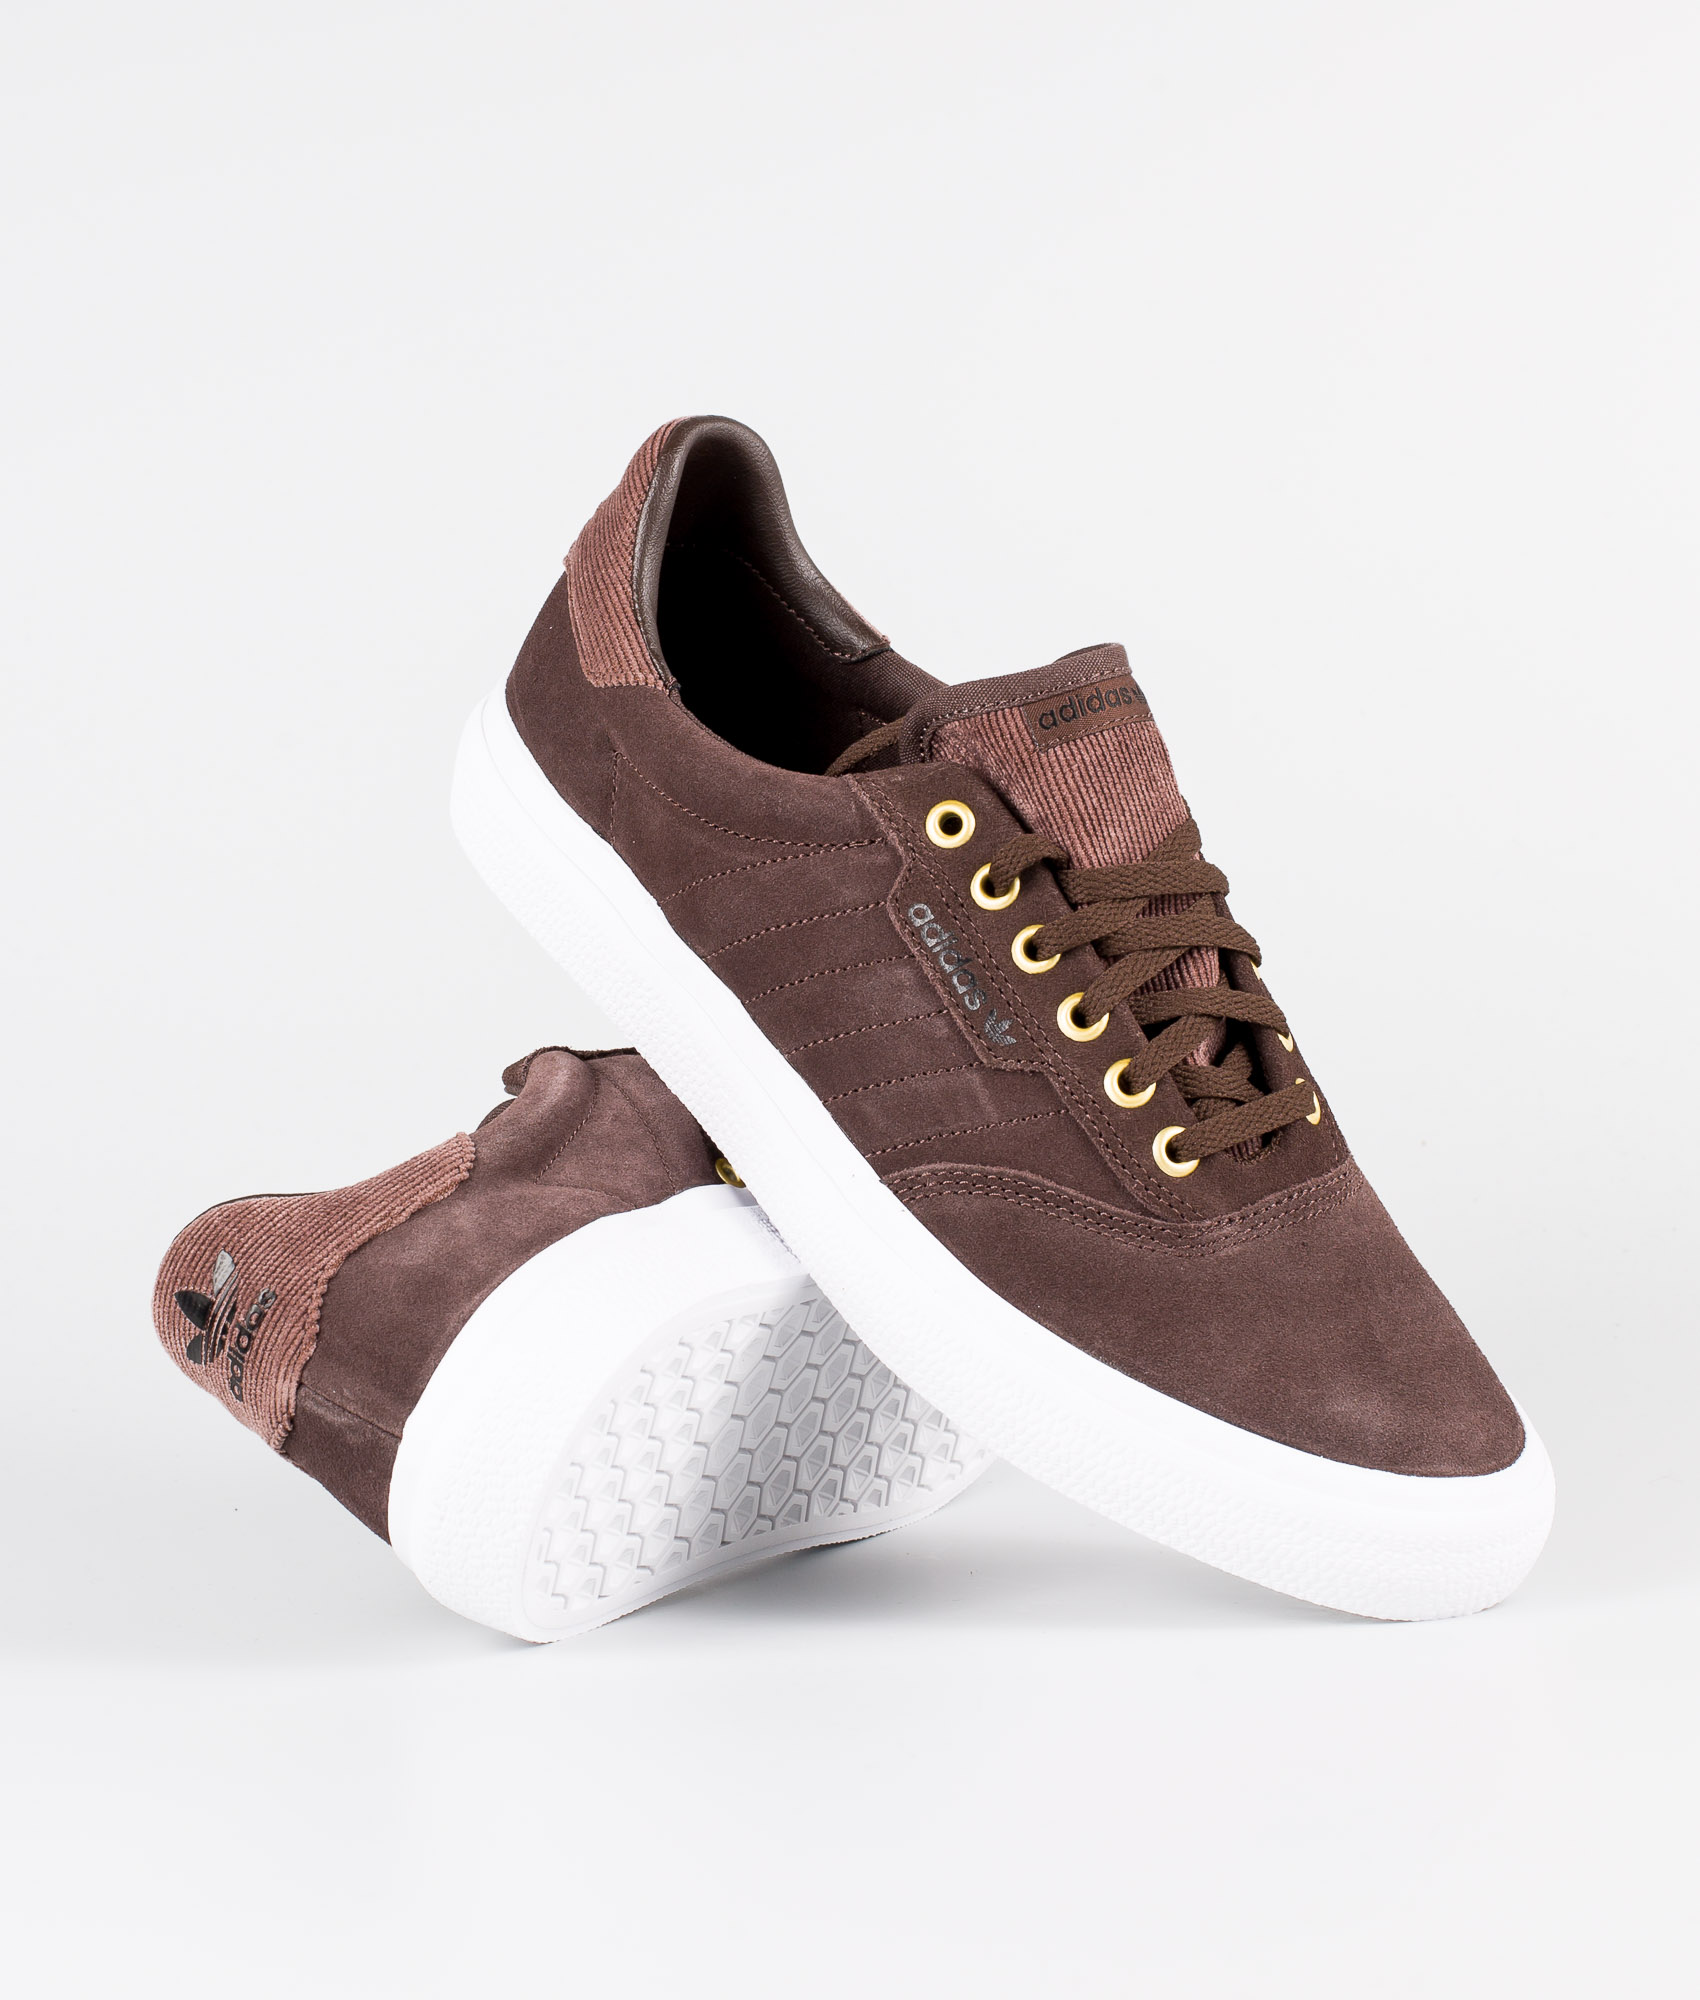 Adidas 3MC Sneakers Ftwr WhiteFtwr WhiteGolden Met.